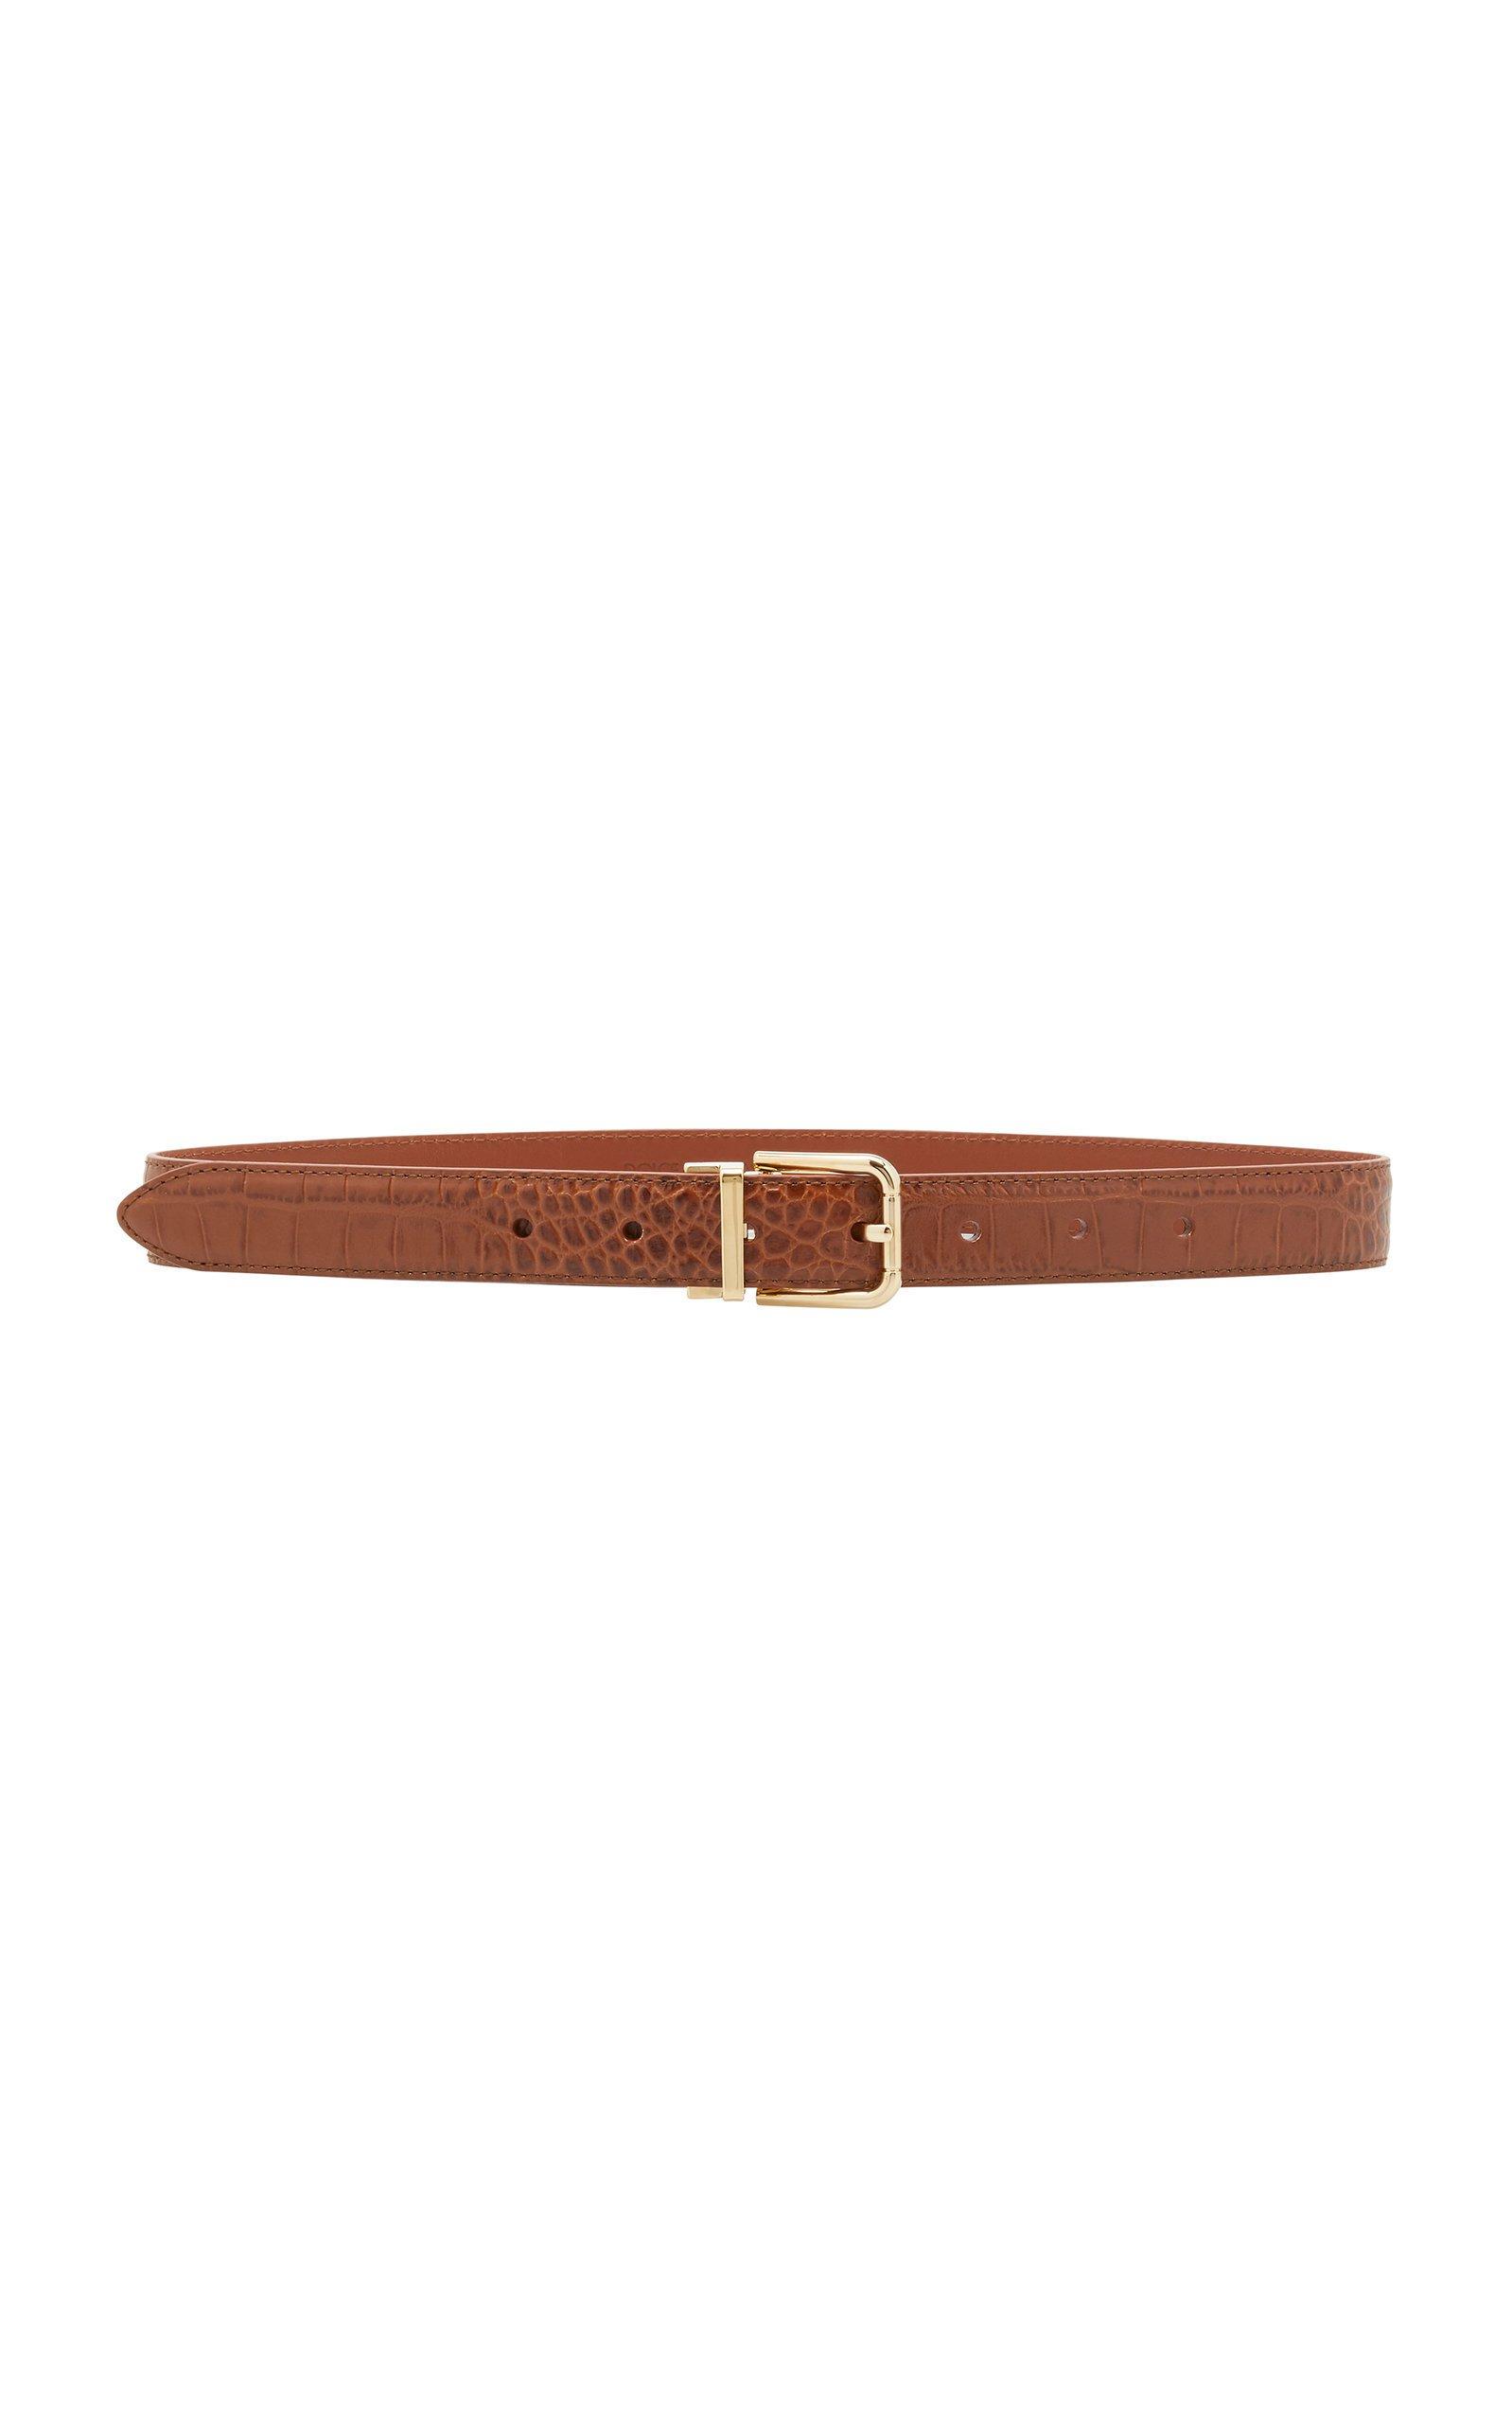 Dolce & Gabbana Croc-Effect Leather Belt Size: 70 cm